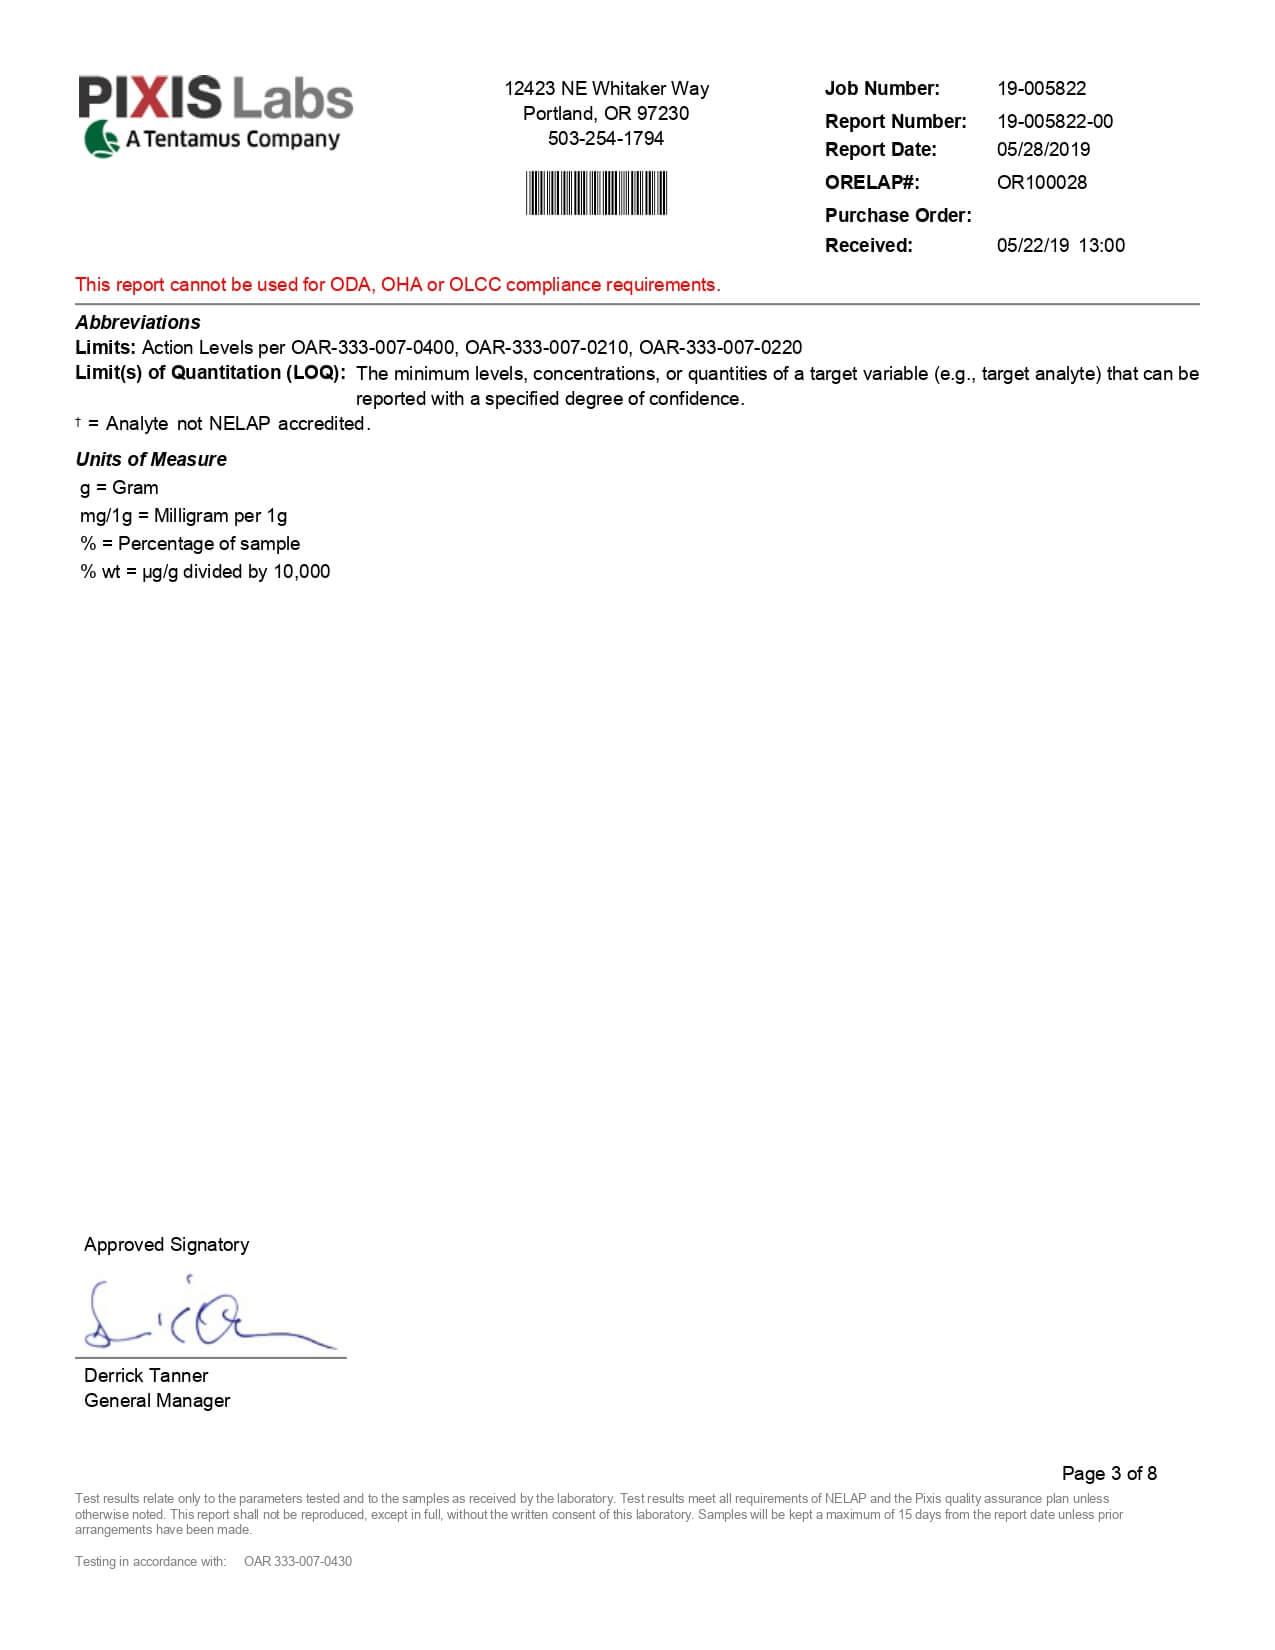 Select CBD Capsule Relax Montel Lab Report